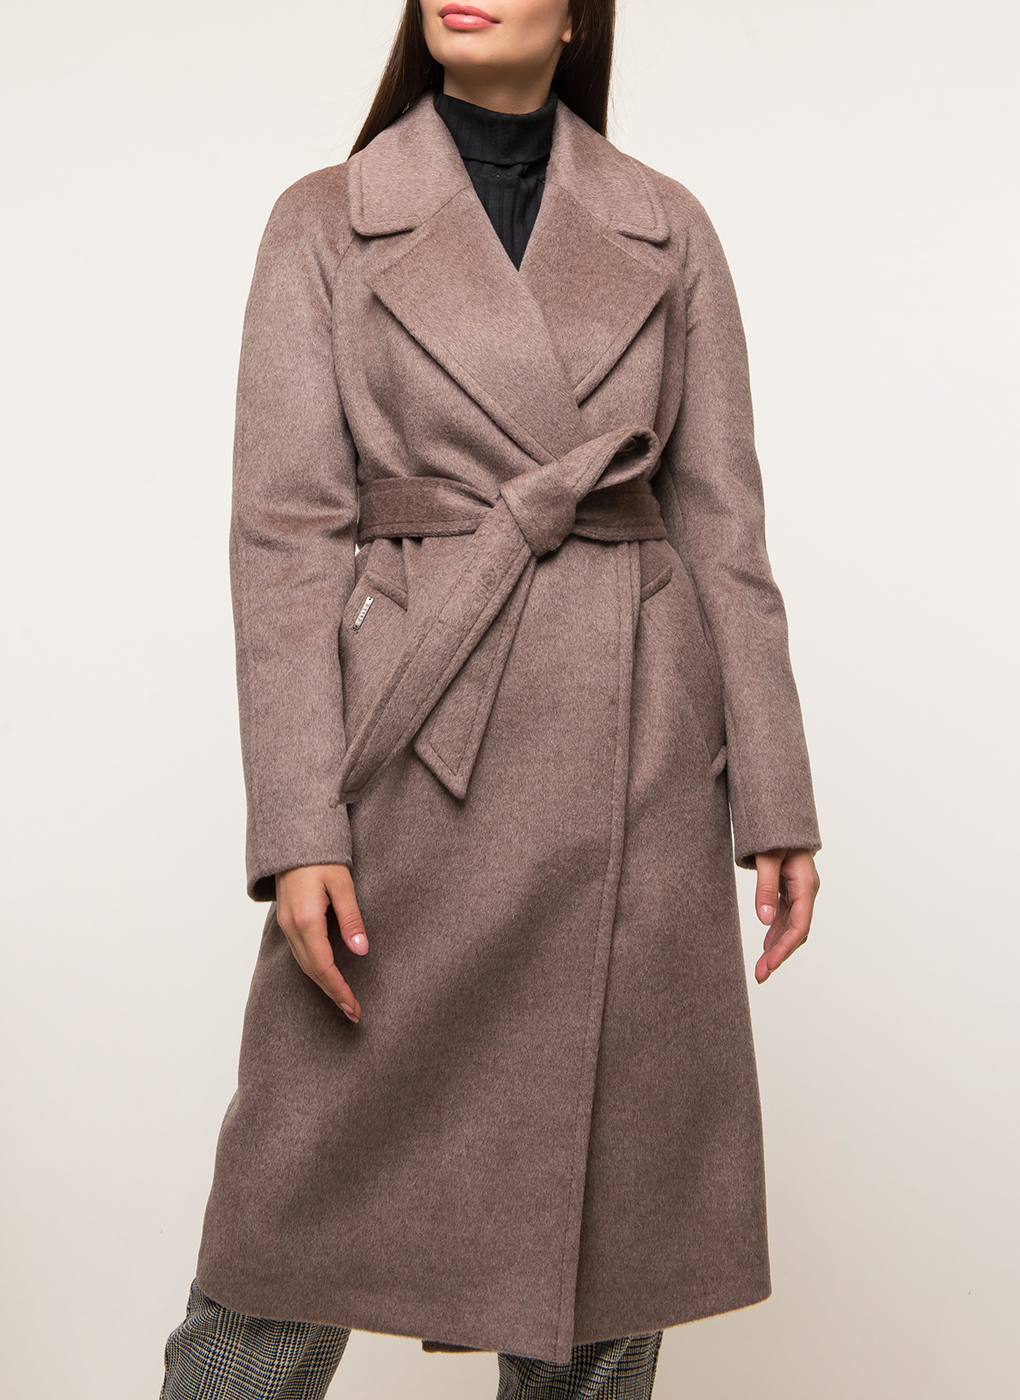 Пальто прямое шерстяное 69, idekka фото